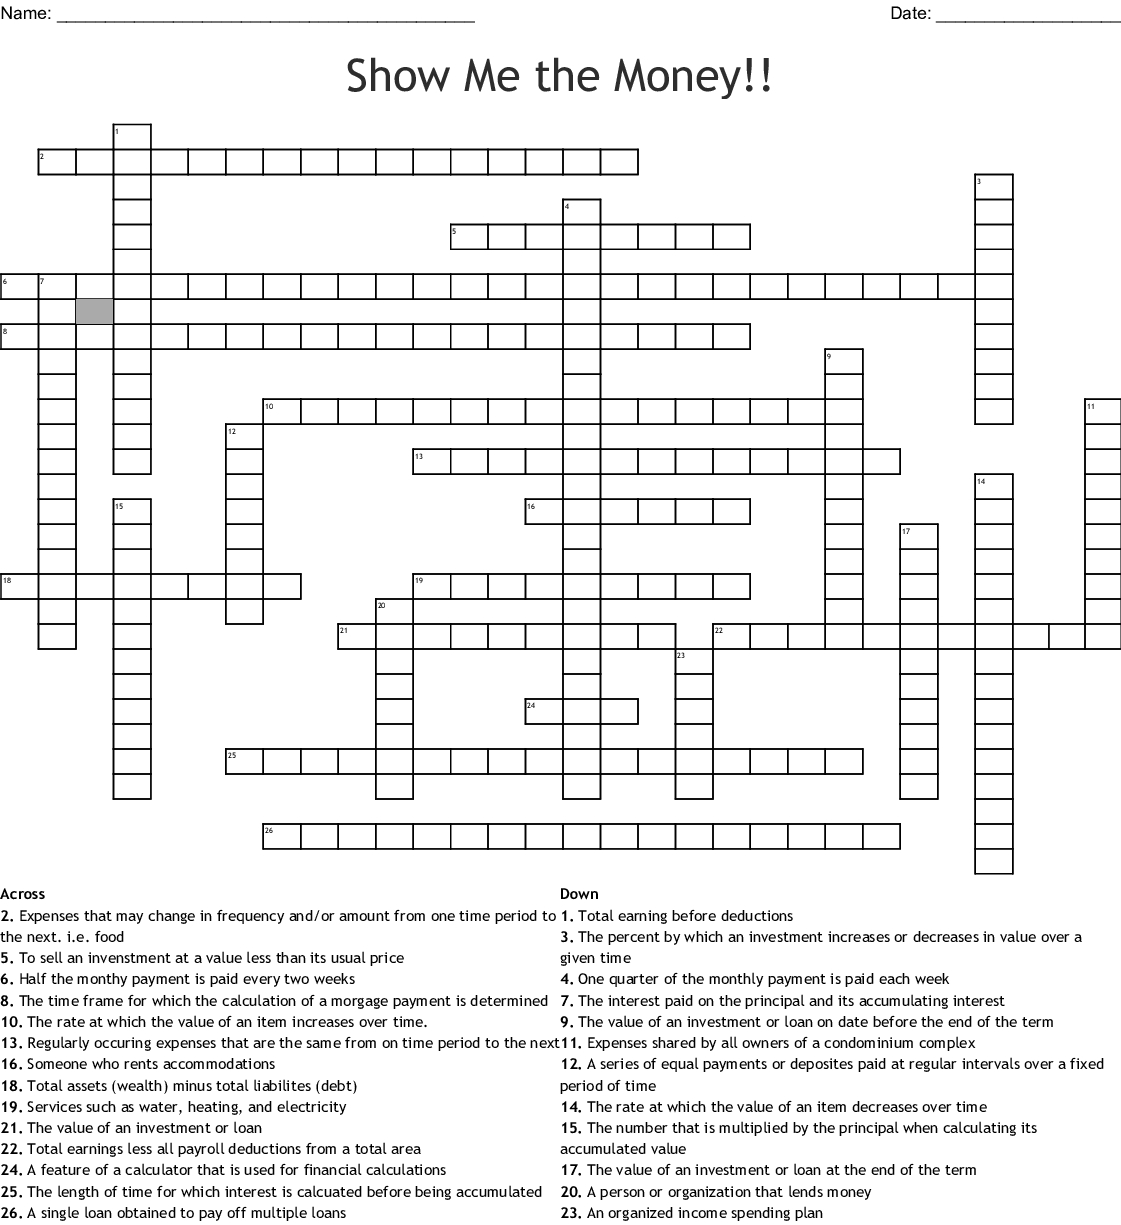 Show Me The Money!! Crossword - Wordmint - Printable Crossword Puzzle Money